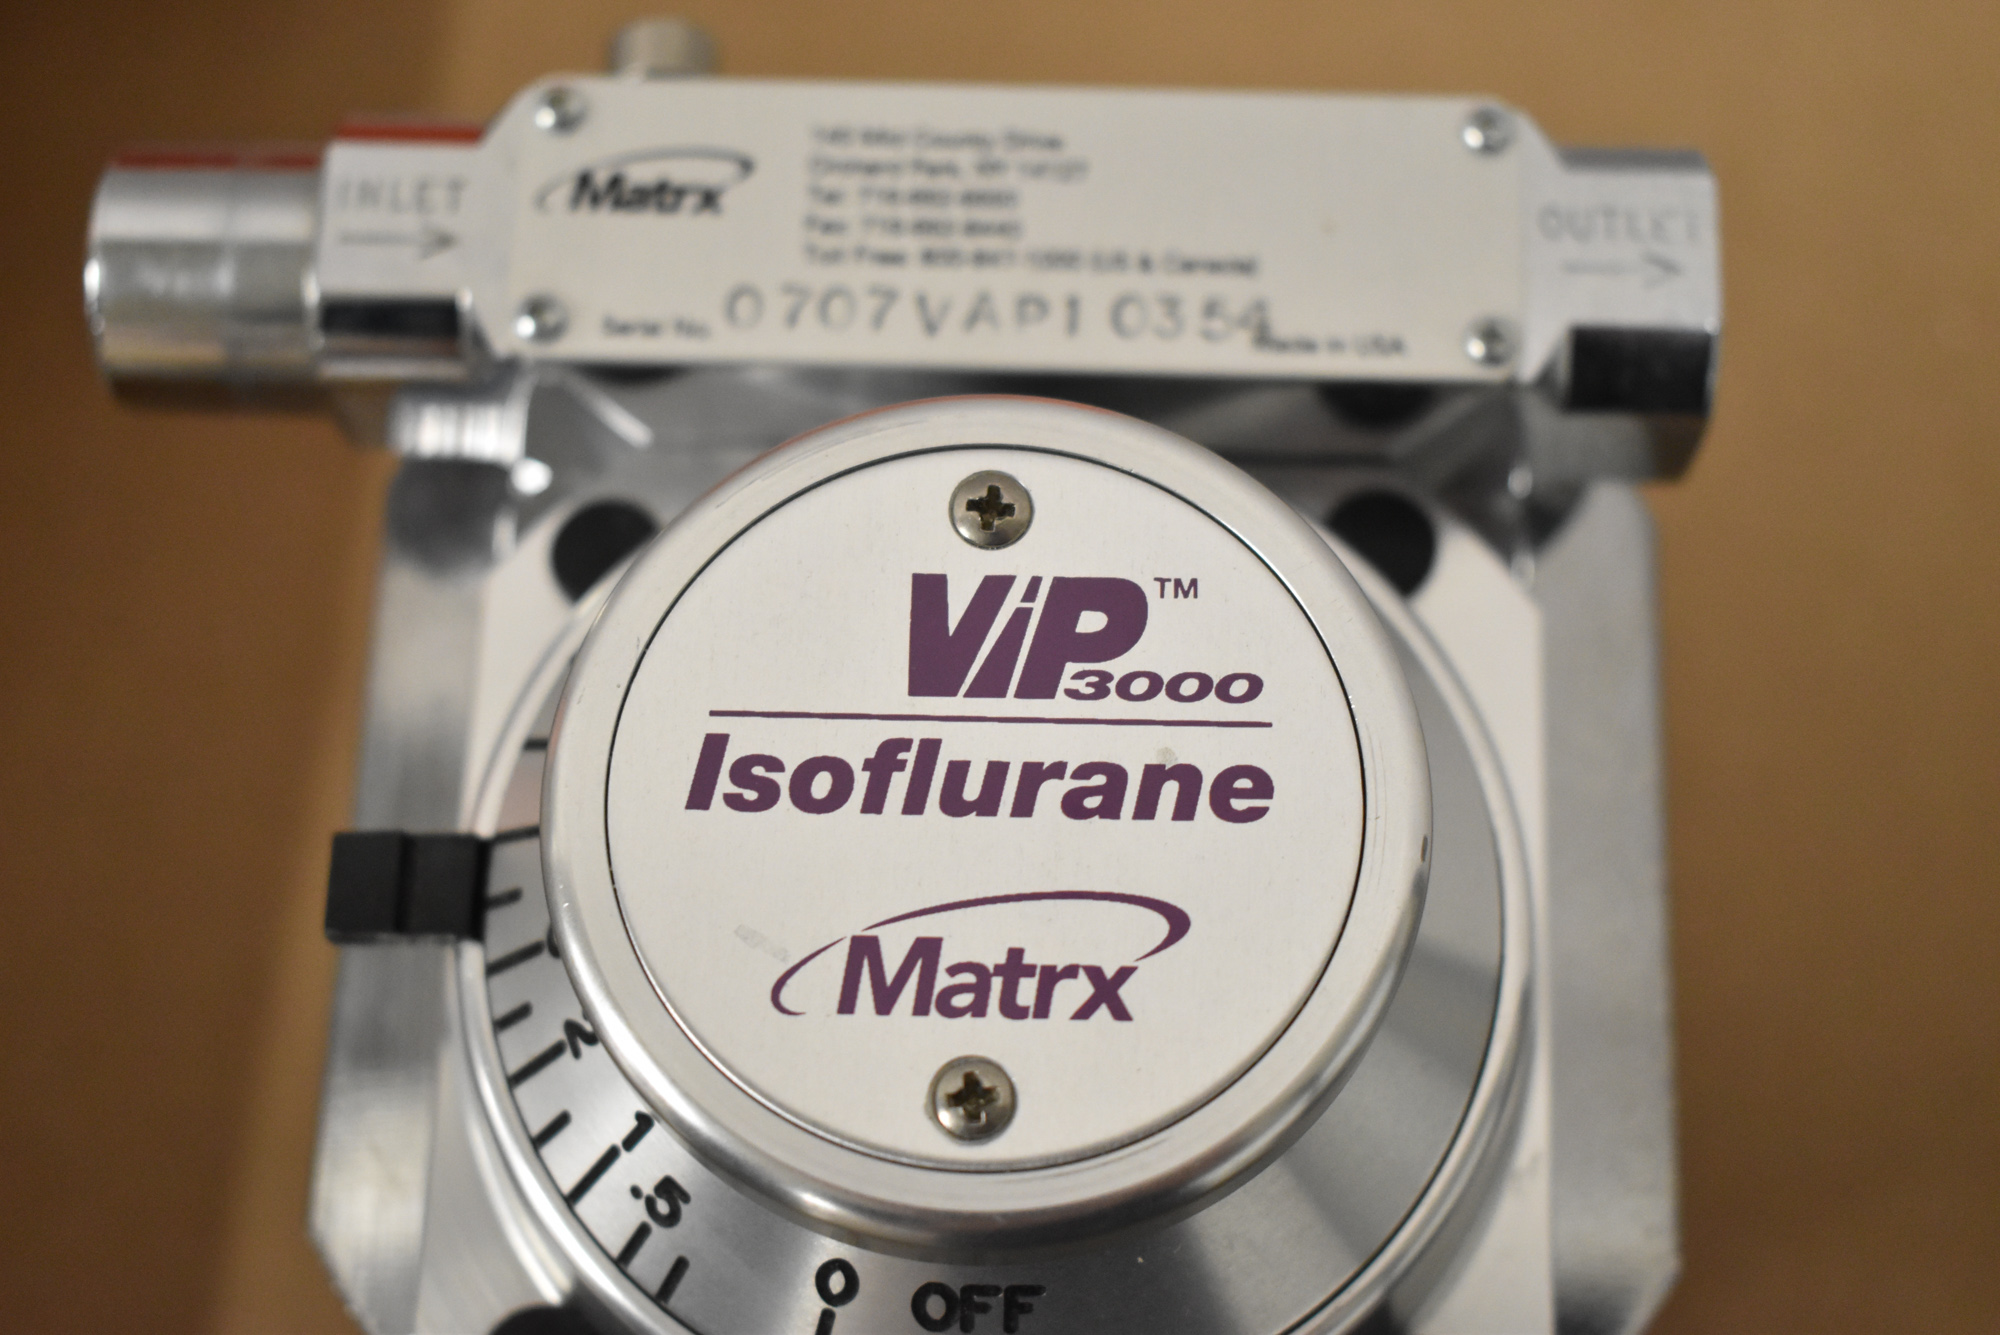 MATRIX VIP3000 ISOFLURANE VAPORIZER, S/N 070VAP10354 [$10 USD OPTIONAL LOADING FEE - CONTACT - Image 3 of 3